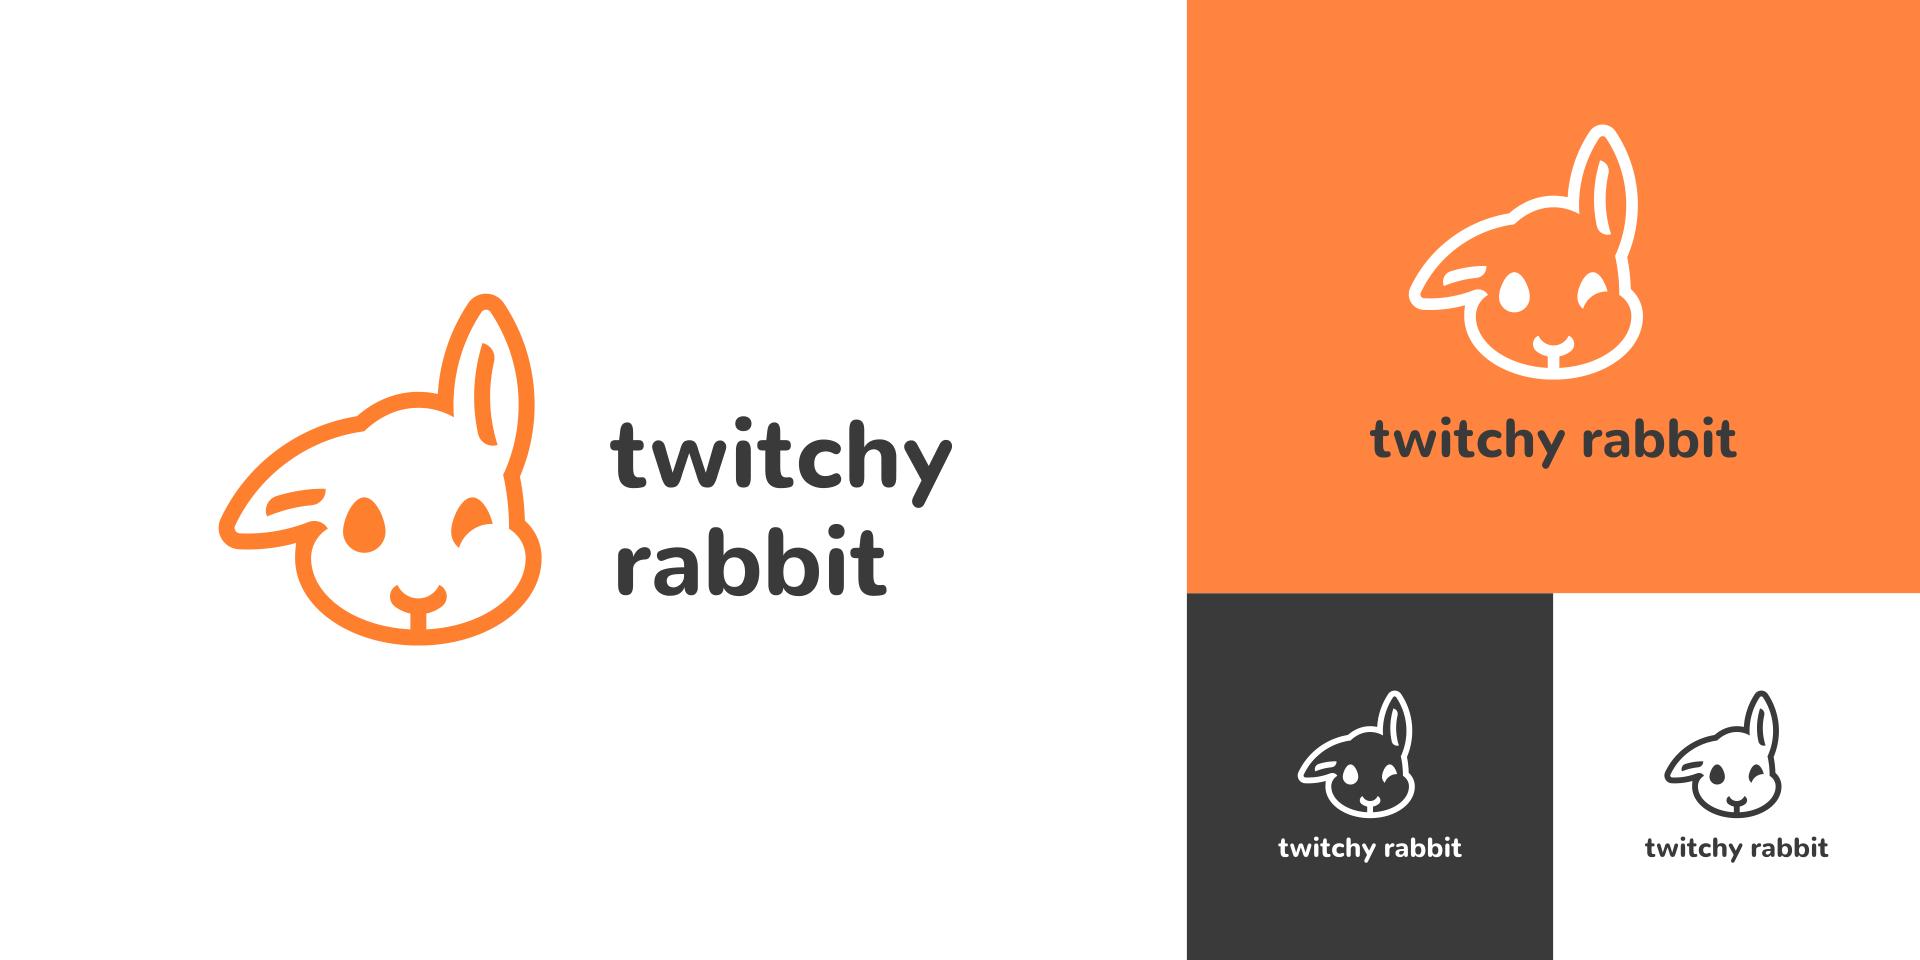 Twitchy Rabbit logo versions